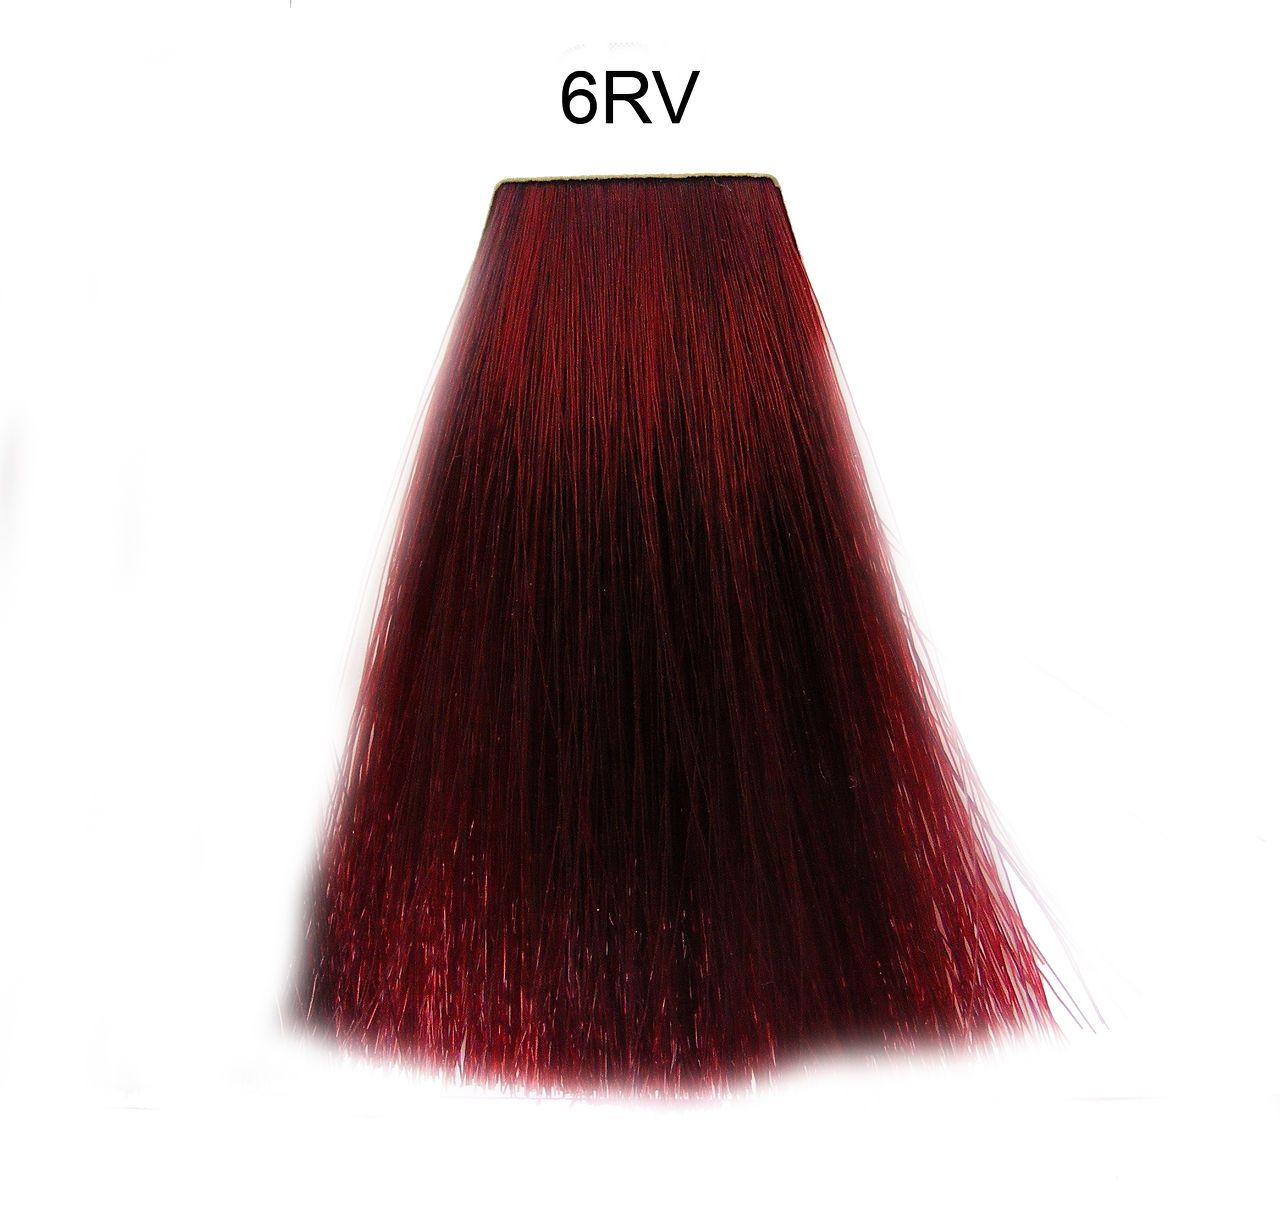 Vopsea Matrix Socolor 6rv Blond Inchis Rosu Violet 90ml